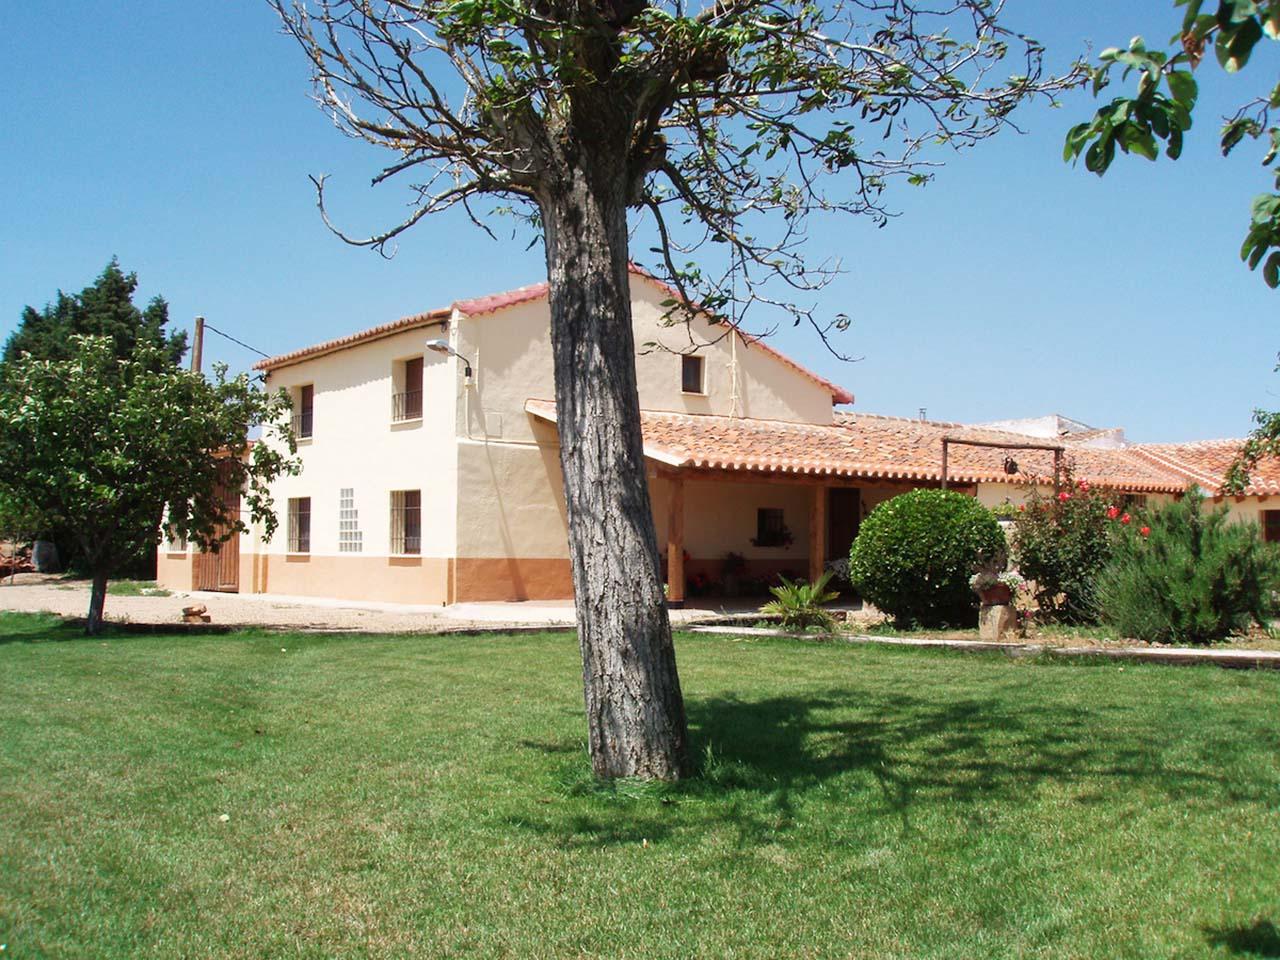 La Huerta El Tordo, casa rural en Manganeses de La Lampreana, lagunas de Villafafila, Zamora.